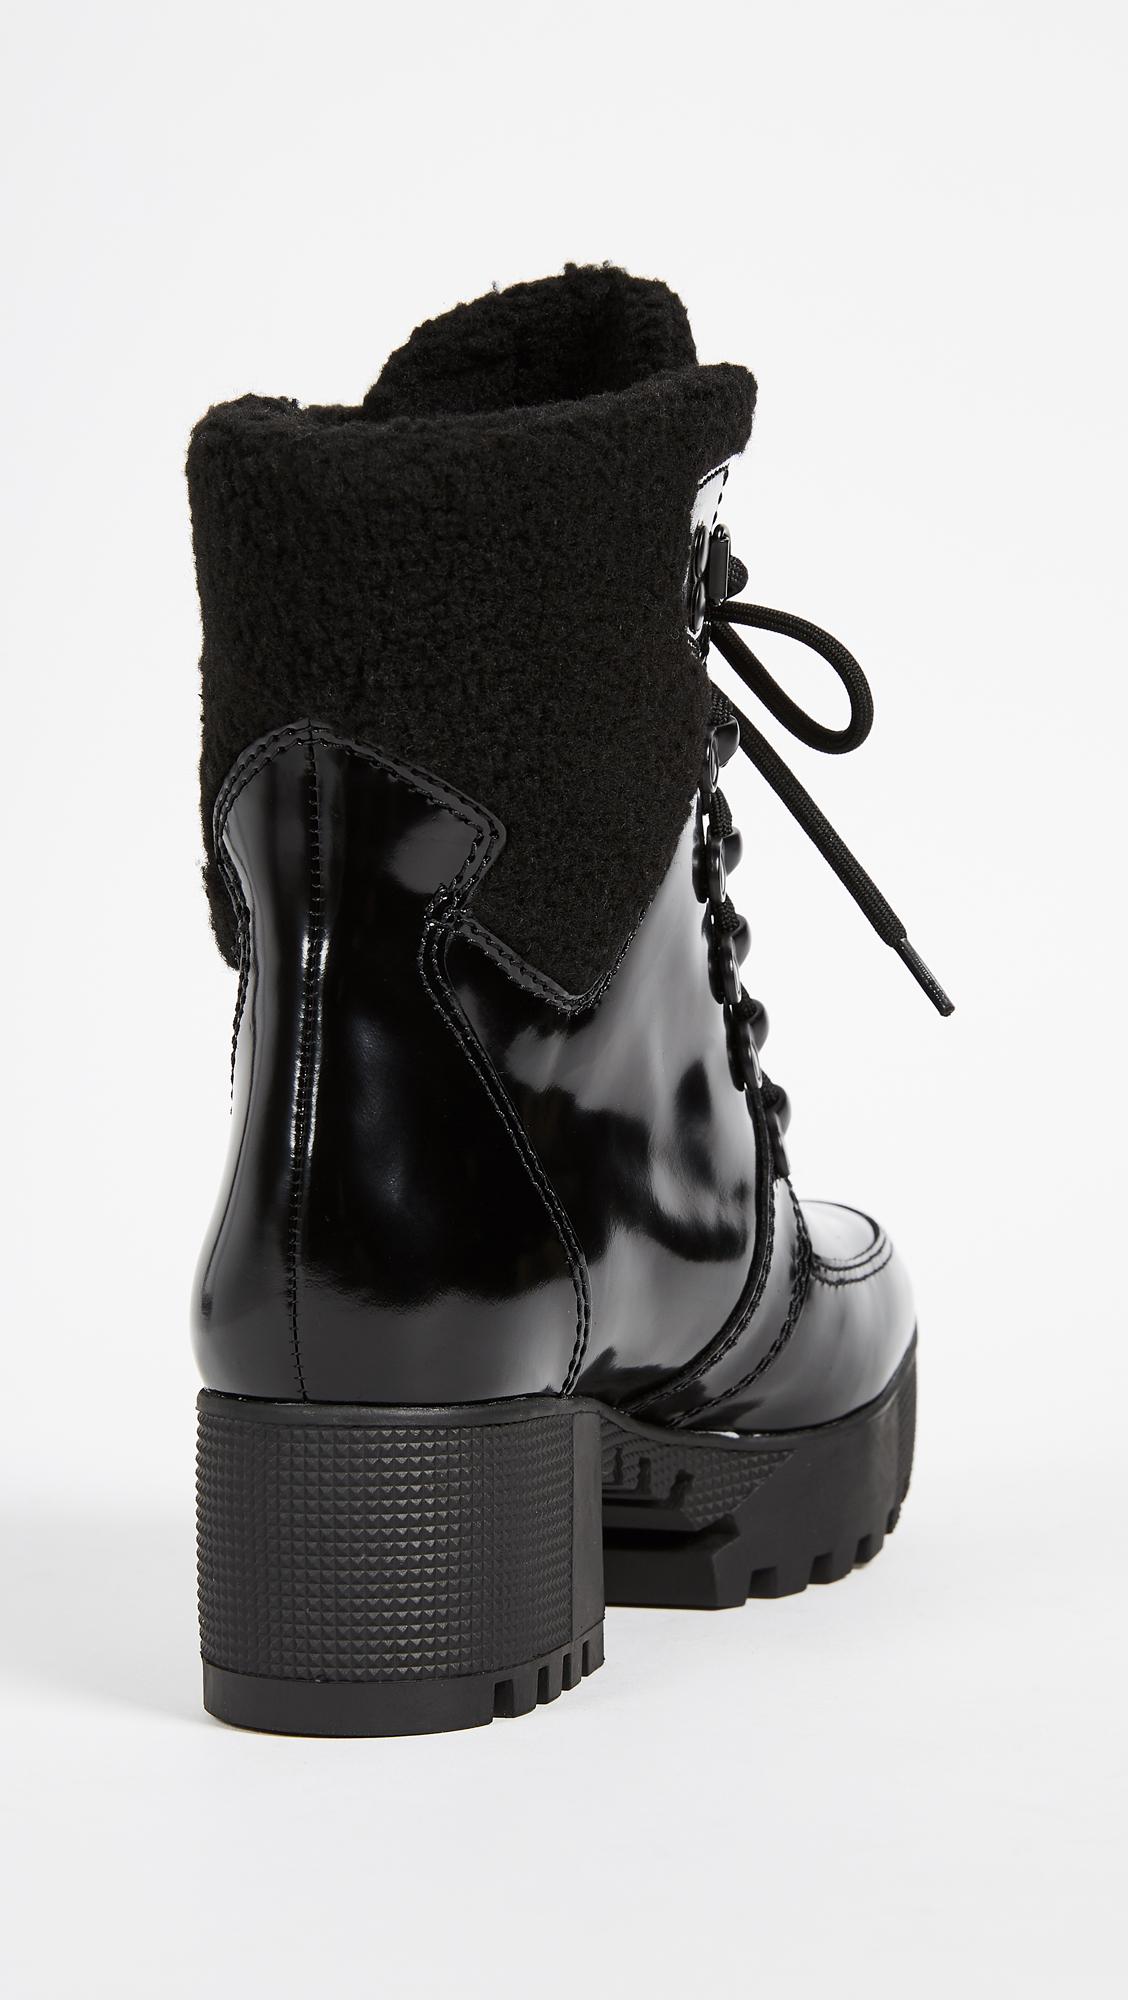 Kendall + Kylie Liza Women's Boots Black Multi Size 7 M